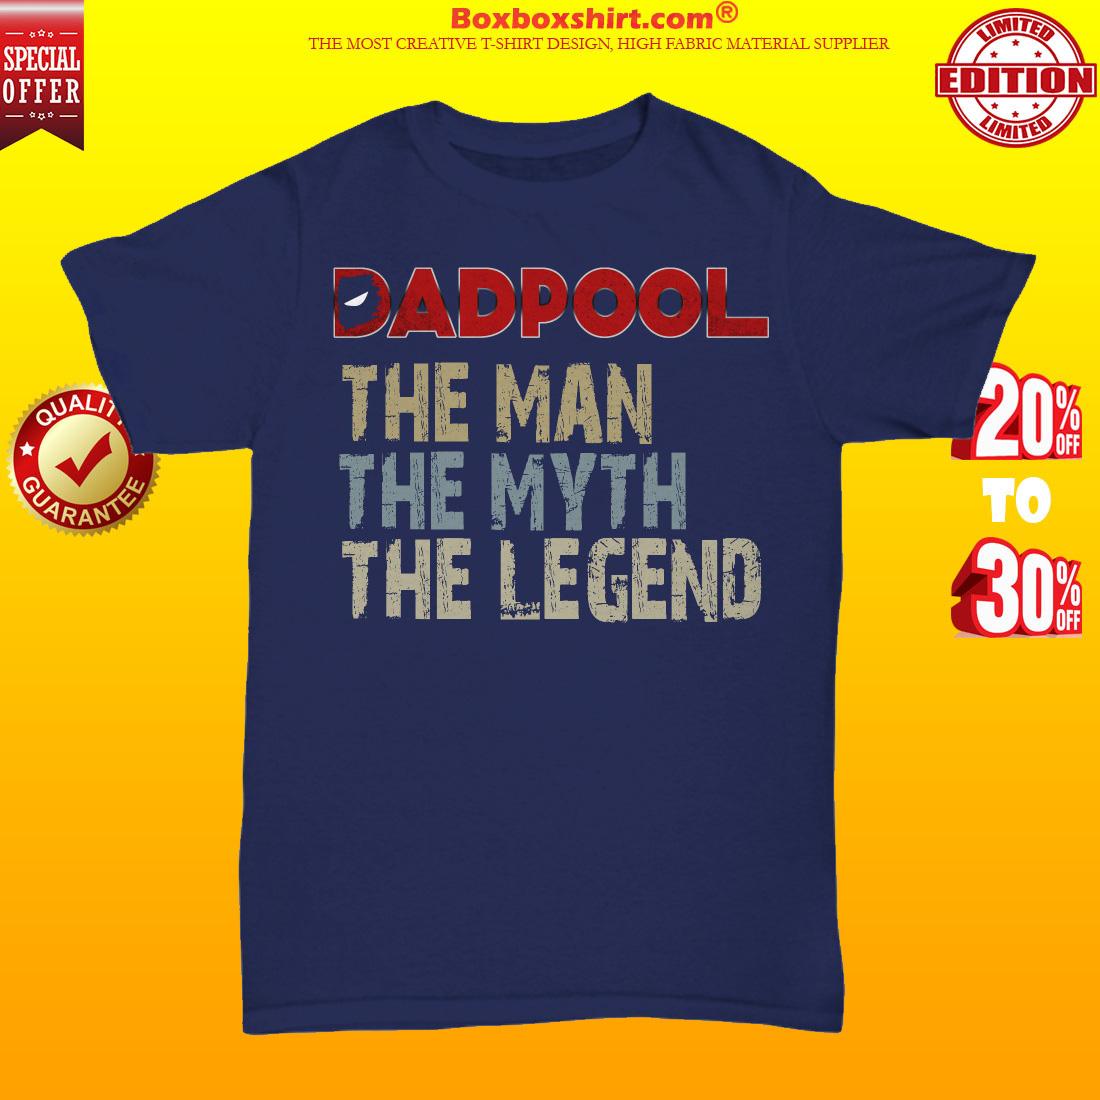 Dadpool the man the myth the legend unisex tee shirt